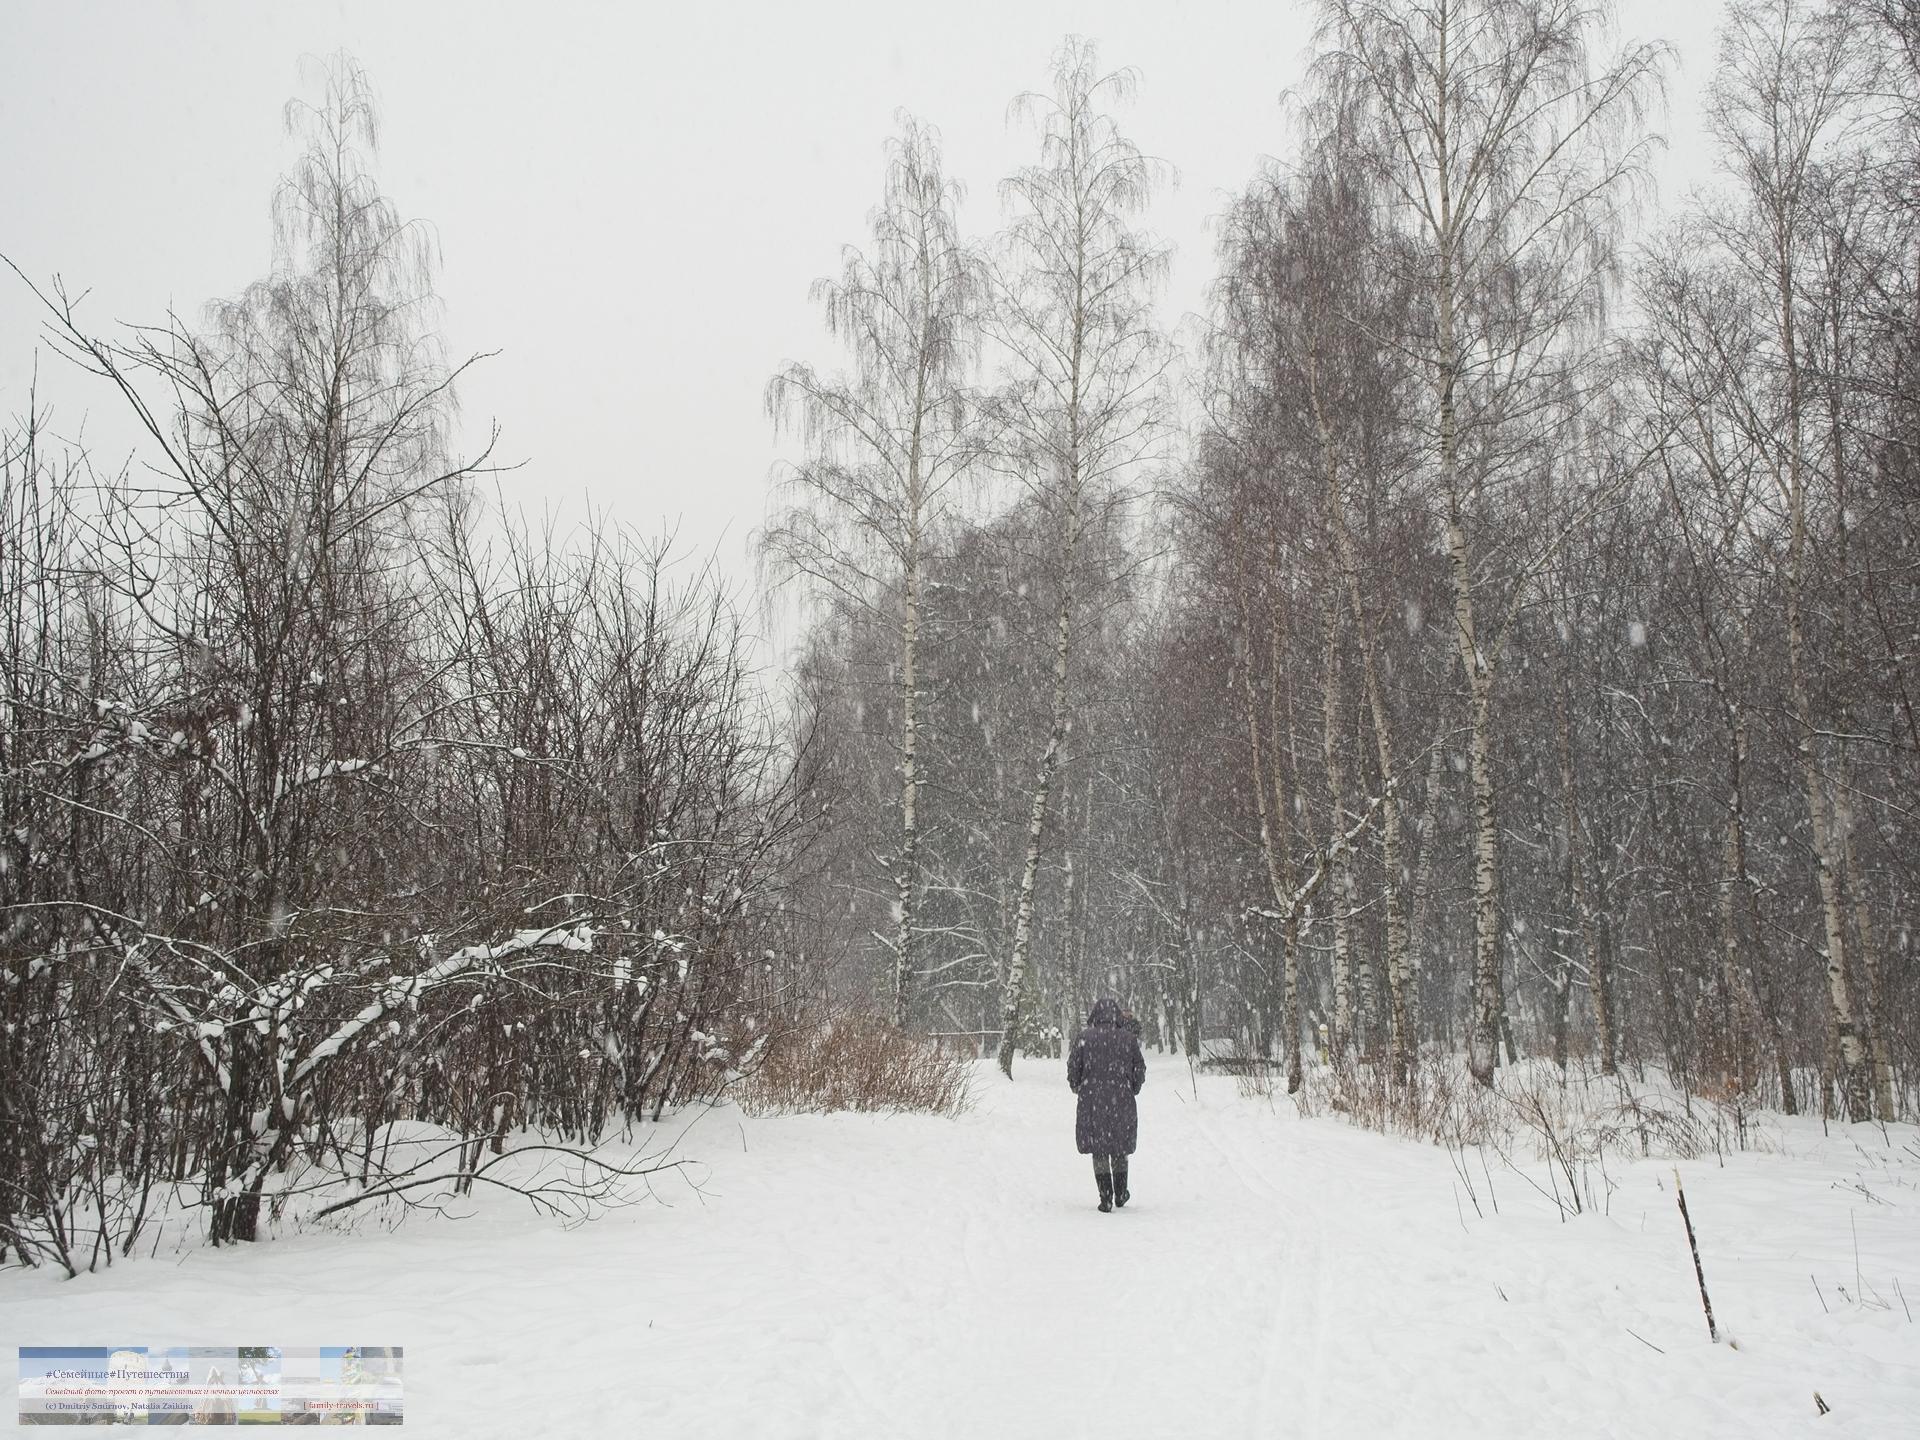 02032018-1232-Blog-017 Просто фото  Снегопад года